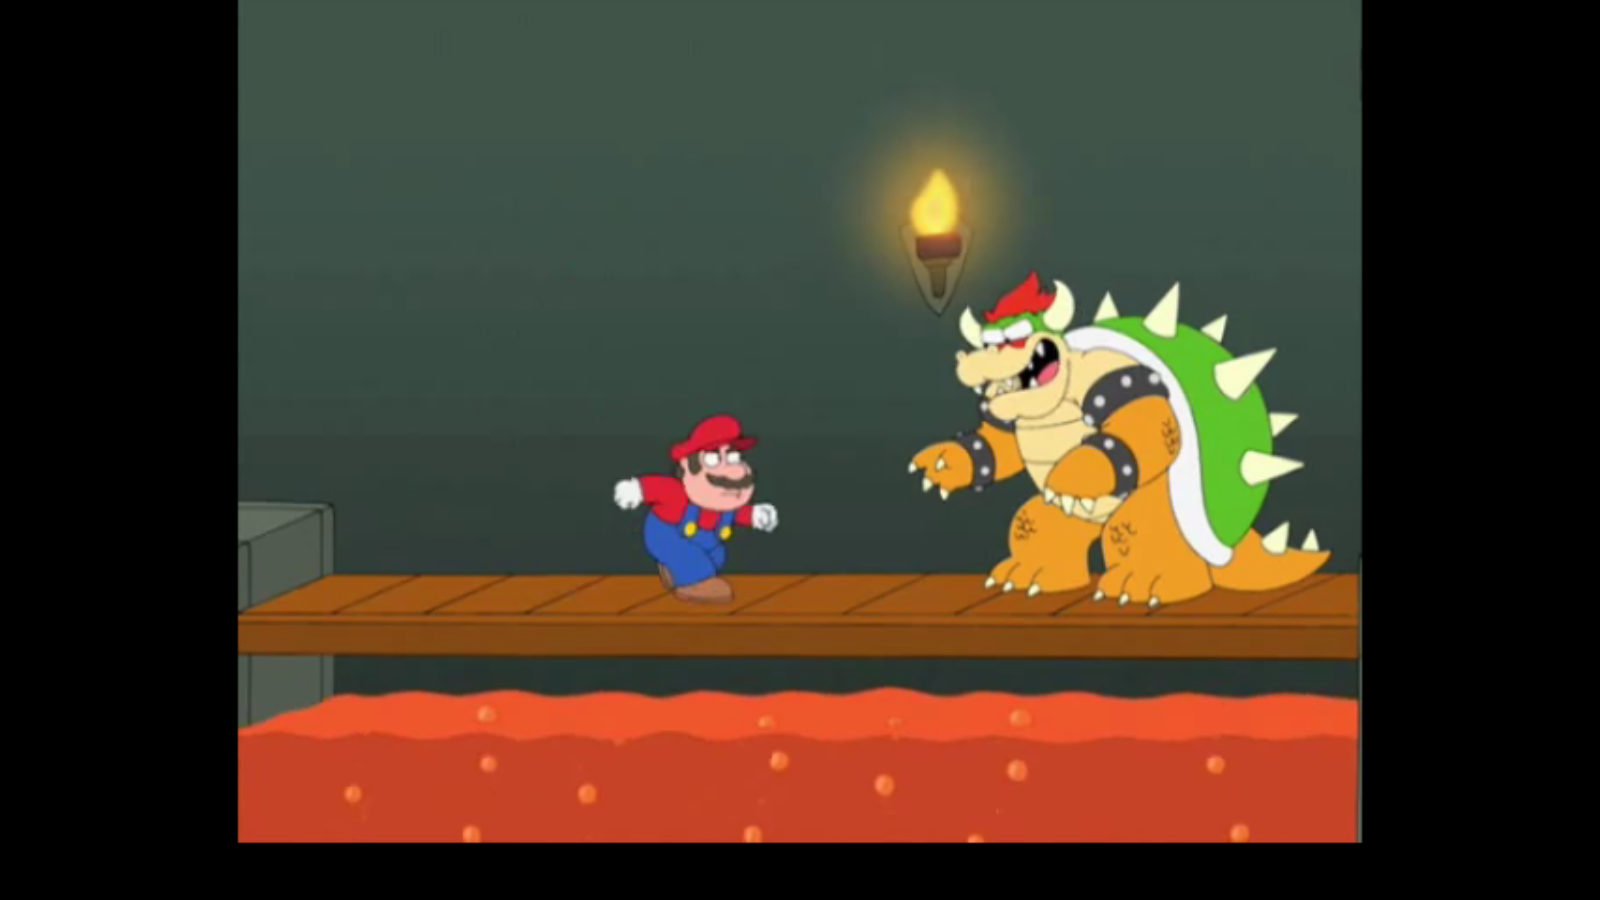 Mario Family Guy Image - Mario et bowse...